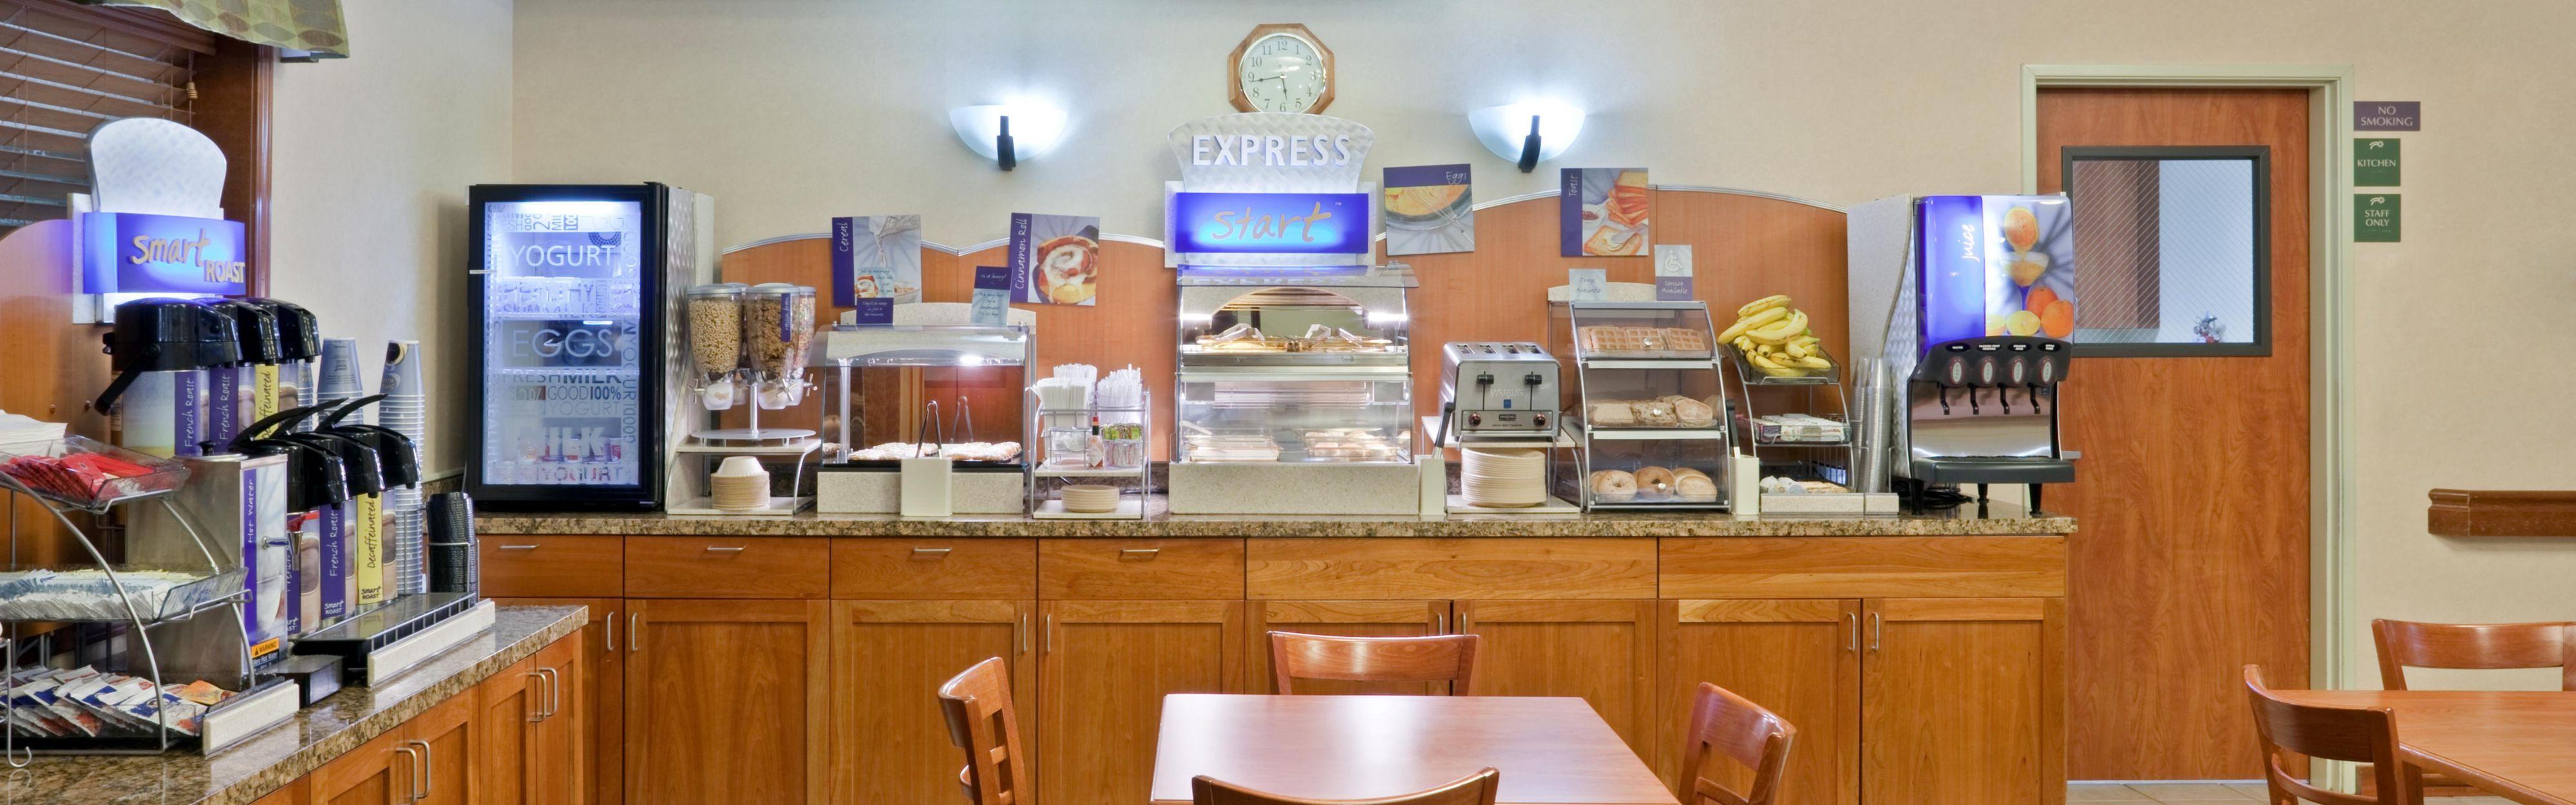 Holiday Inn Express & Suites Burlington image 3